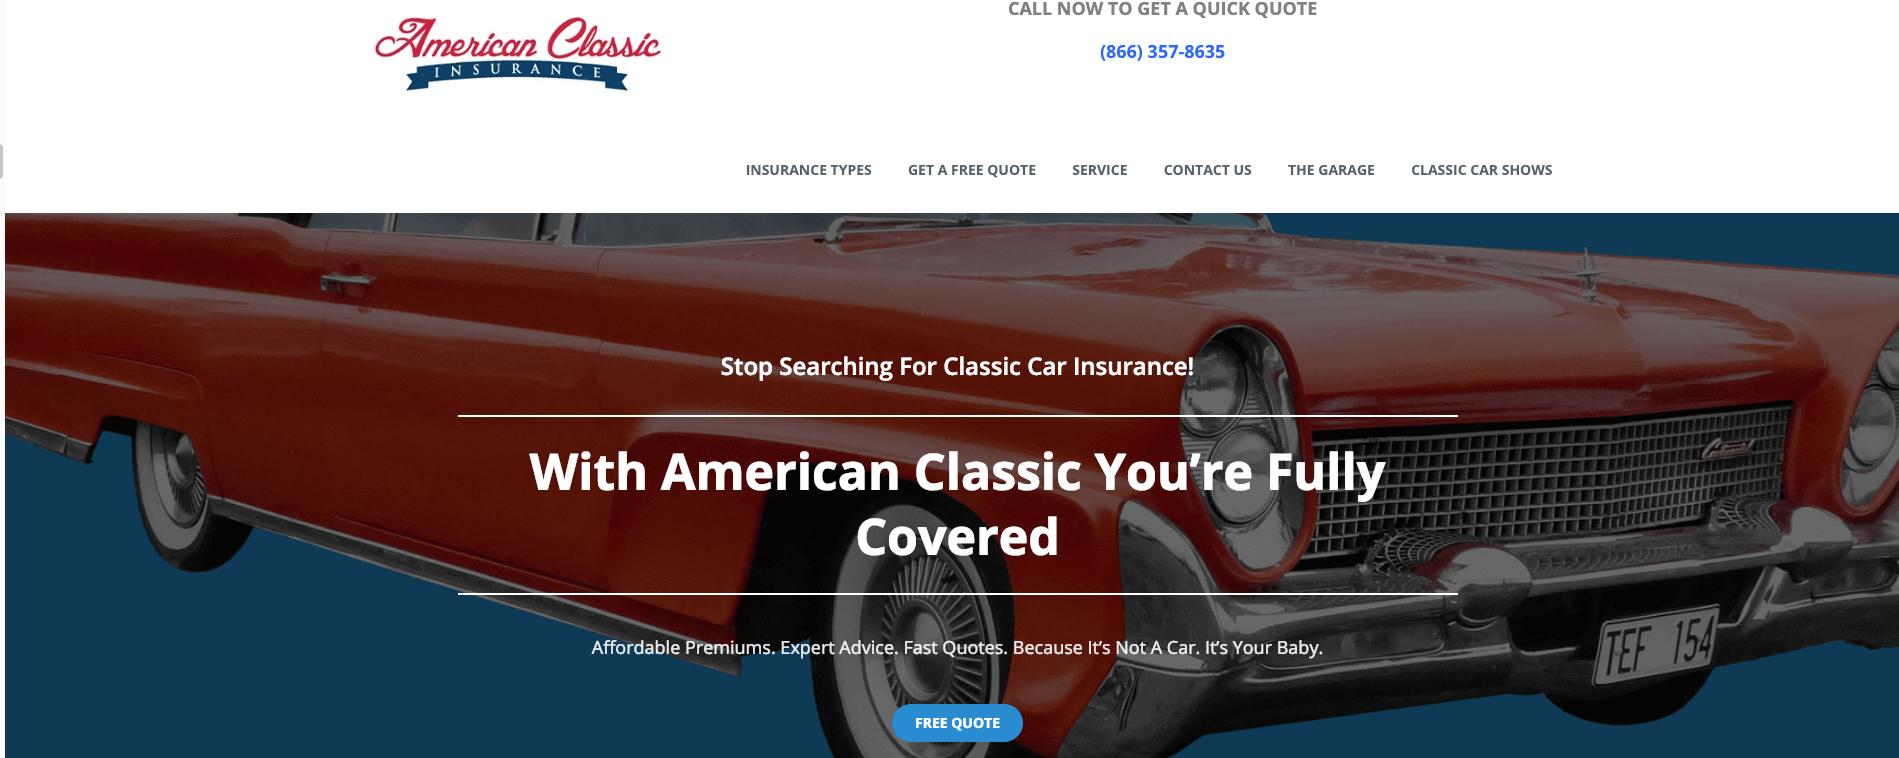 american classic insurance